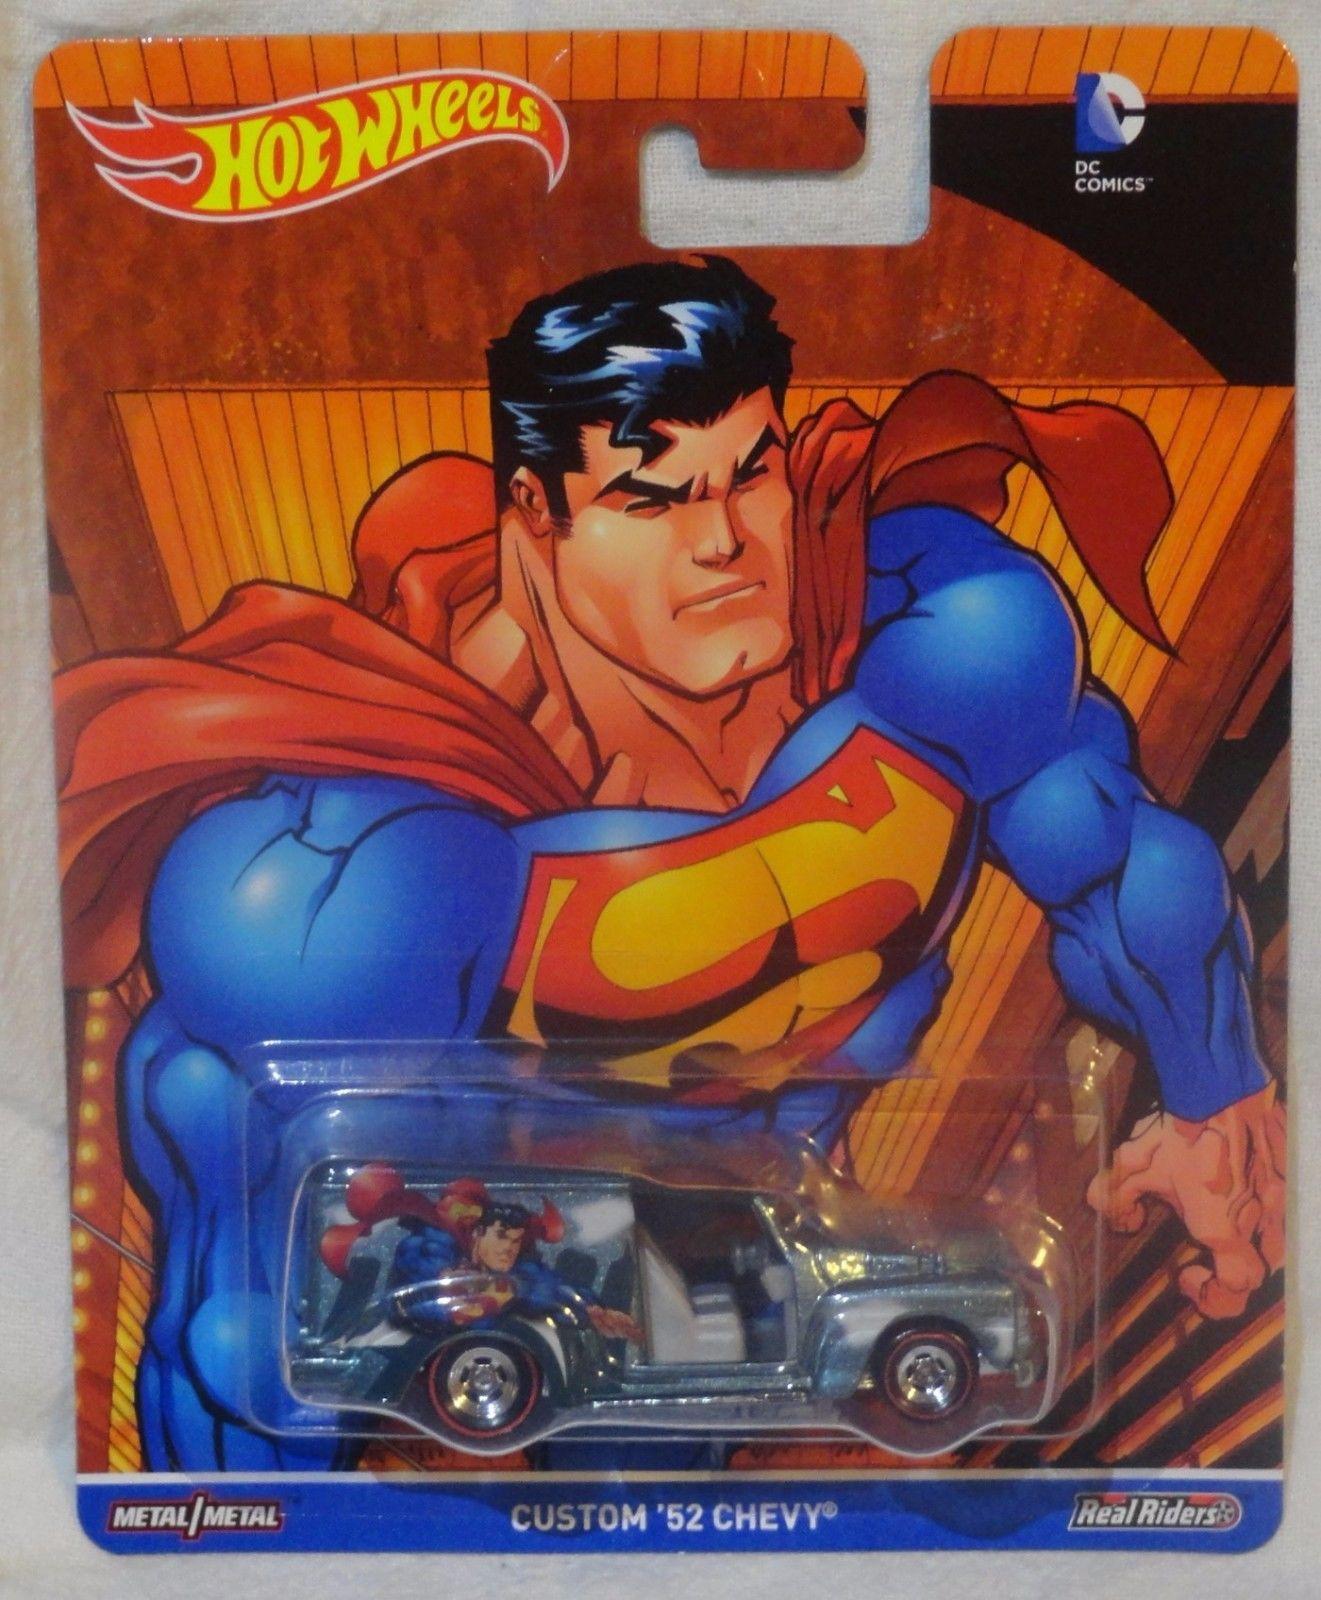 Hot Wheels - Custom 52 Chevy - Superman - DC Comics